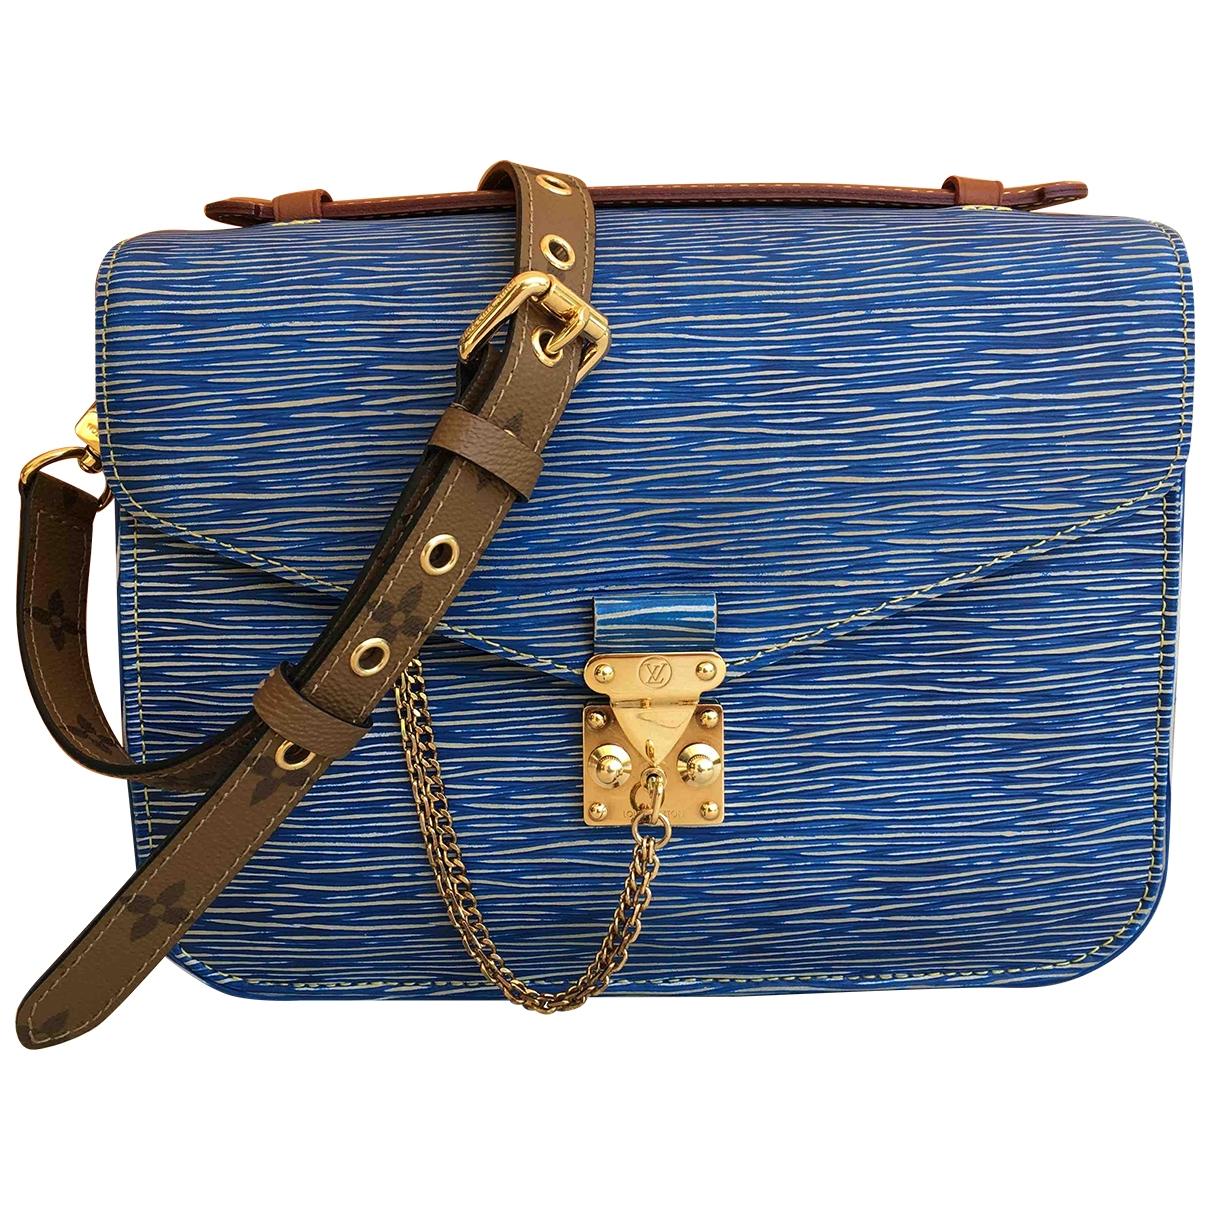 Louis Vuitton Metis Blue Leather handbag for Women \N